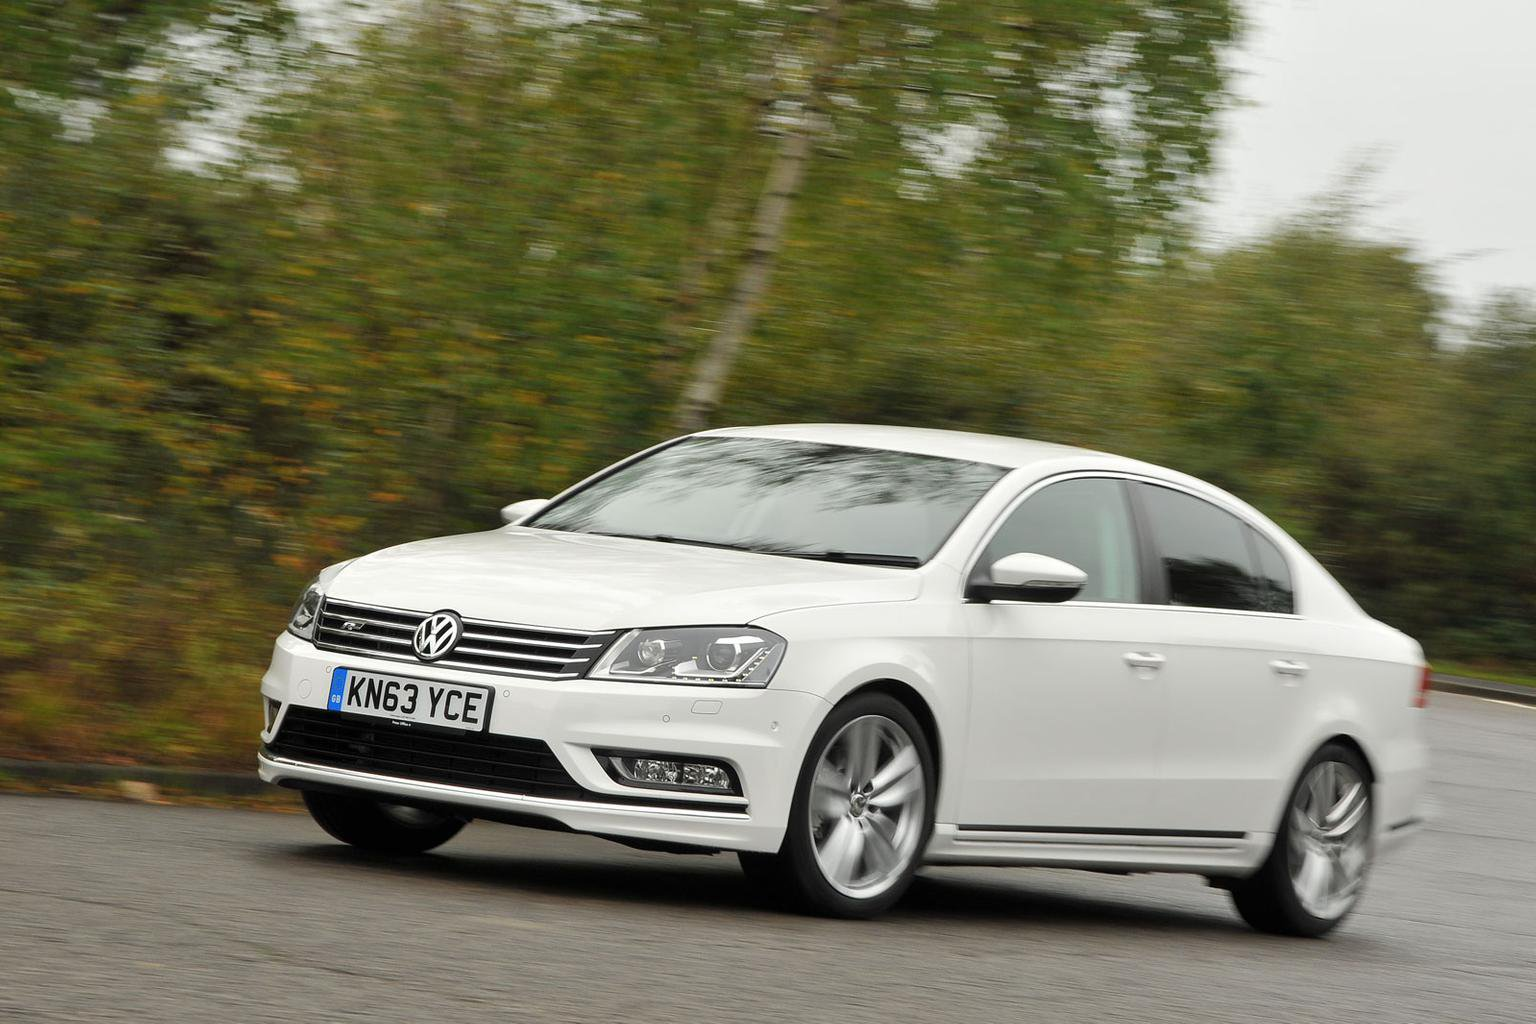 2013 Volkswagen Passat R-Line review | What Car?